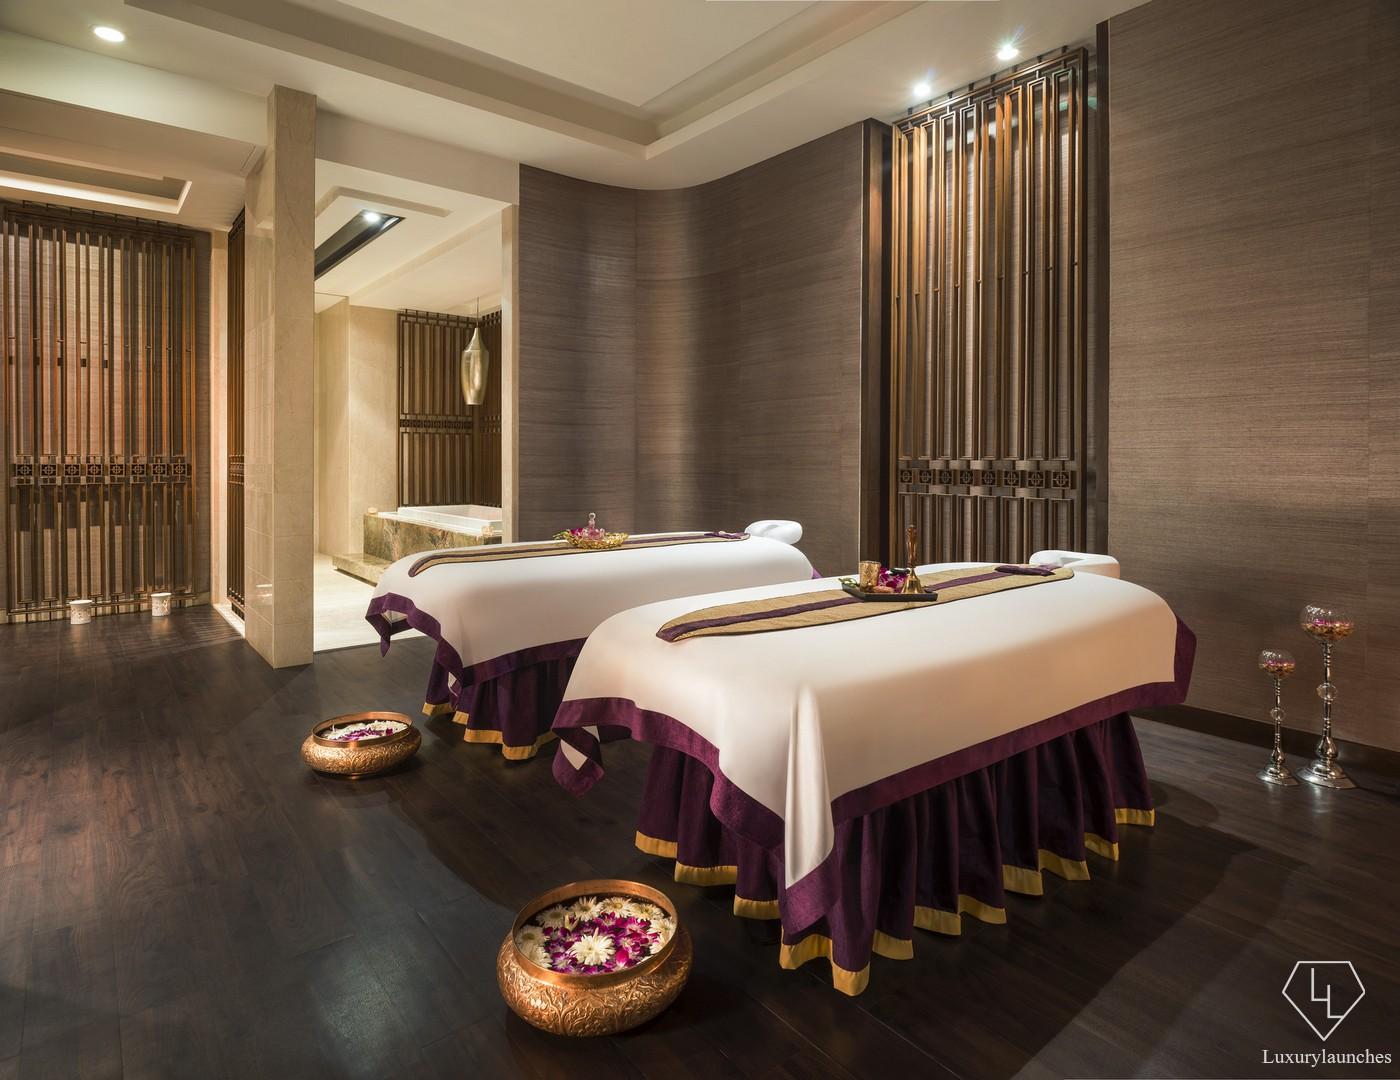 Iridium spa at the st regis mumbai review for Salons in mumbai